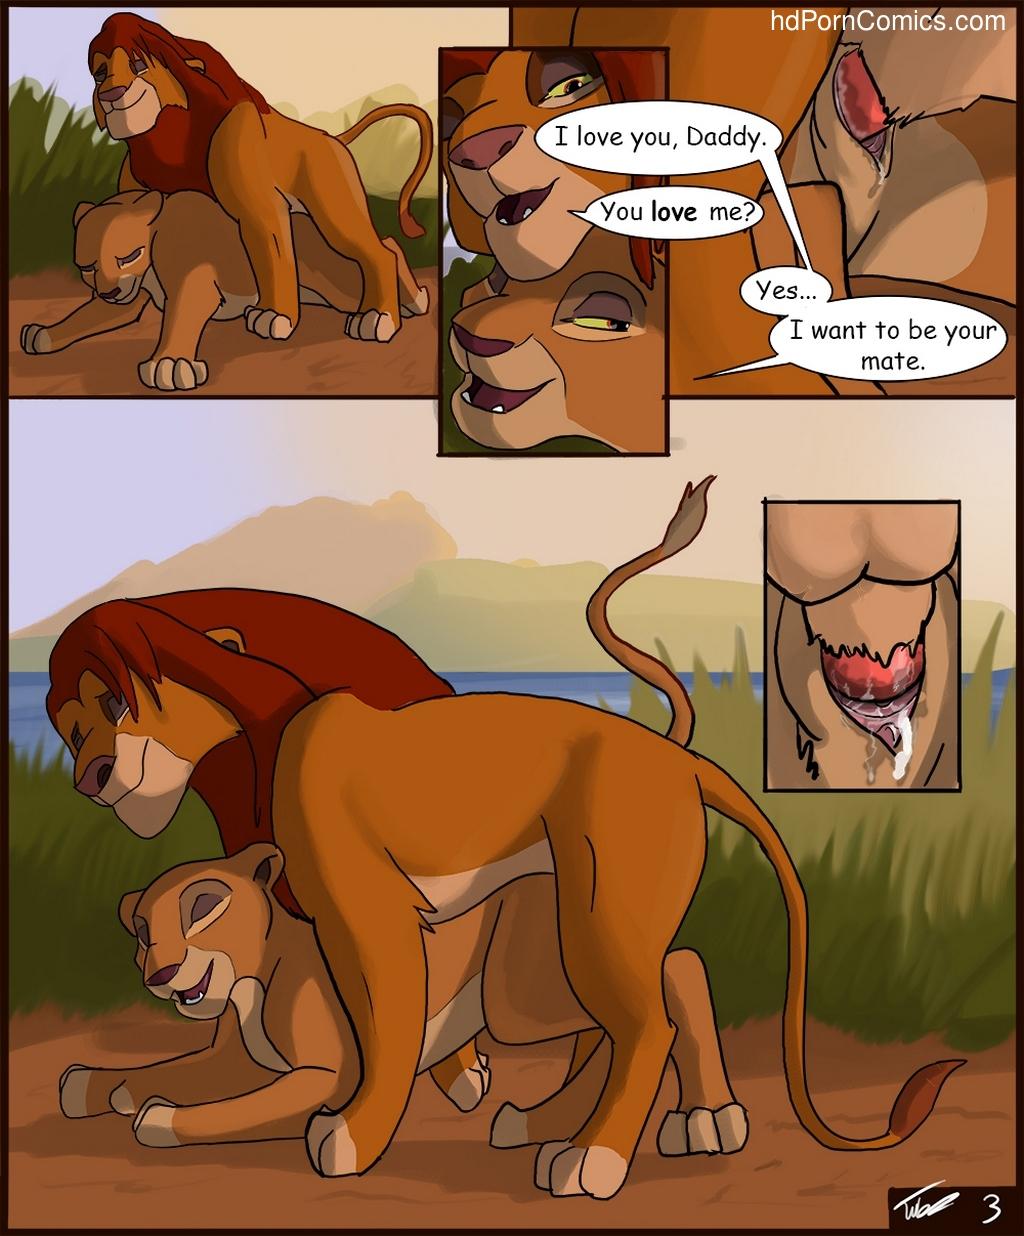 Nackt comic der löwen könig König der